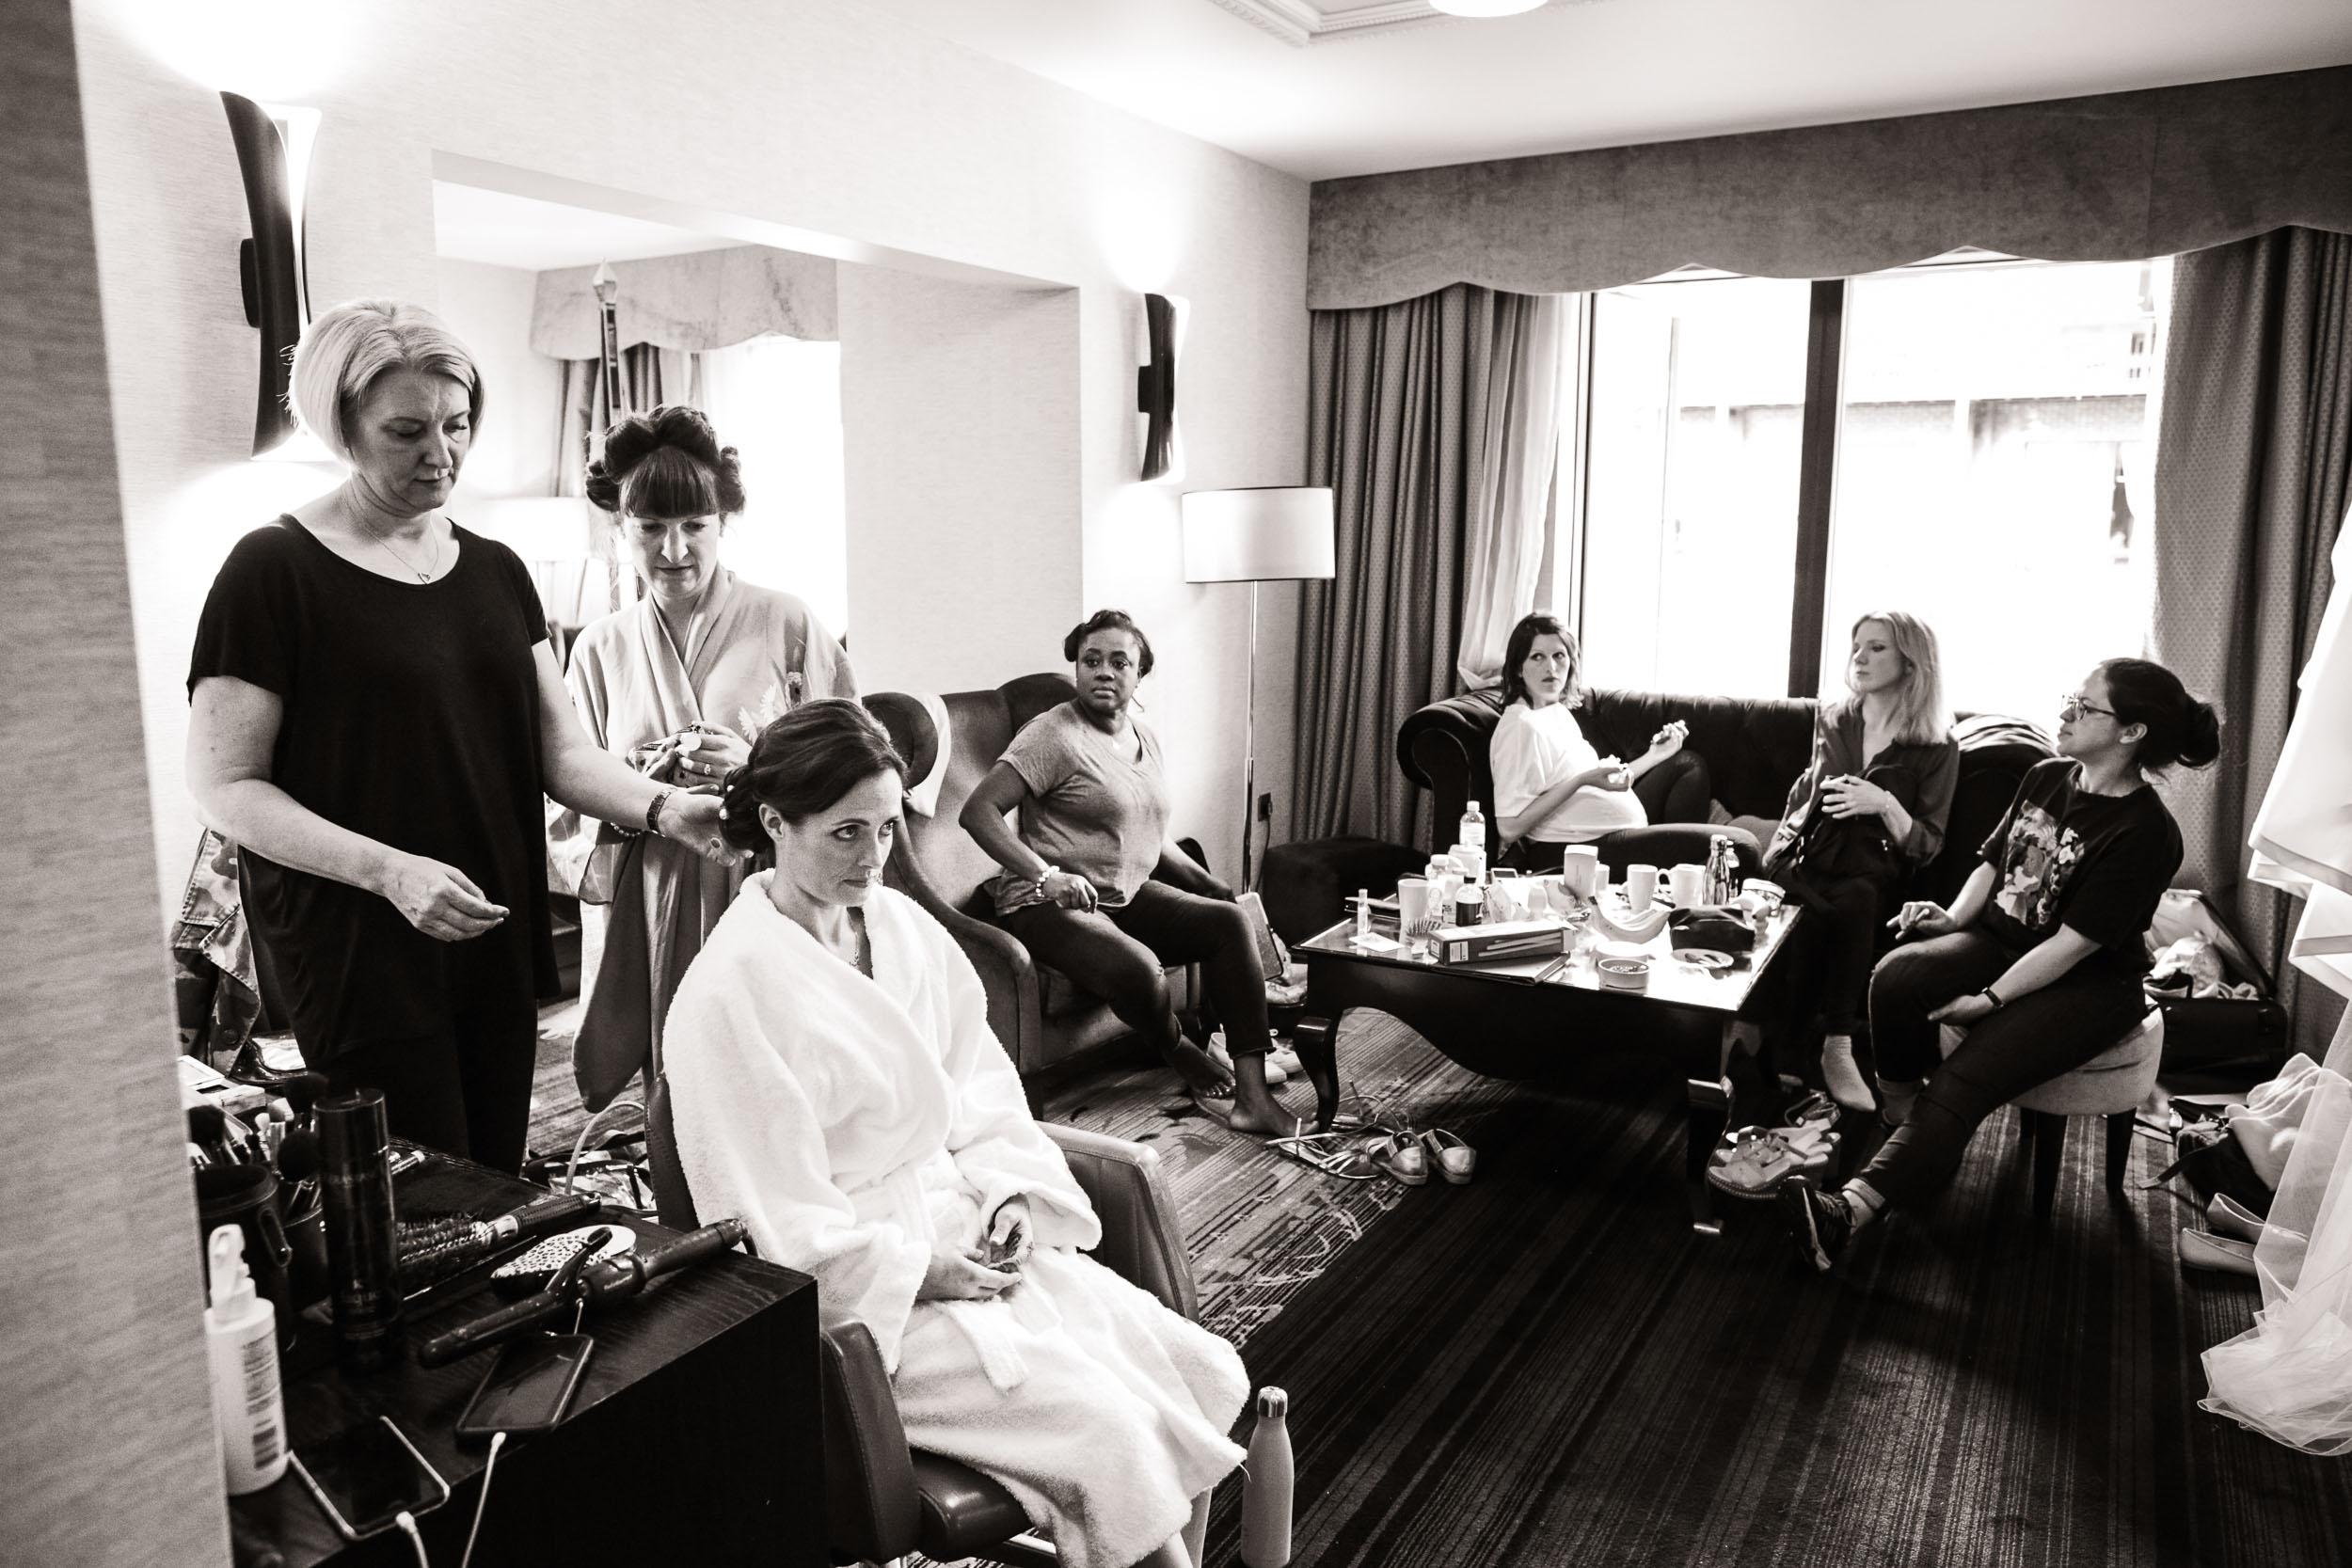 syon-house-wedding-photographer-london 014.jpg